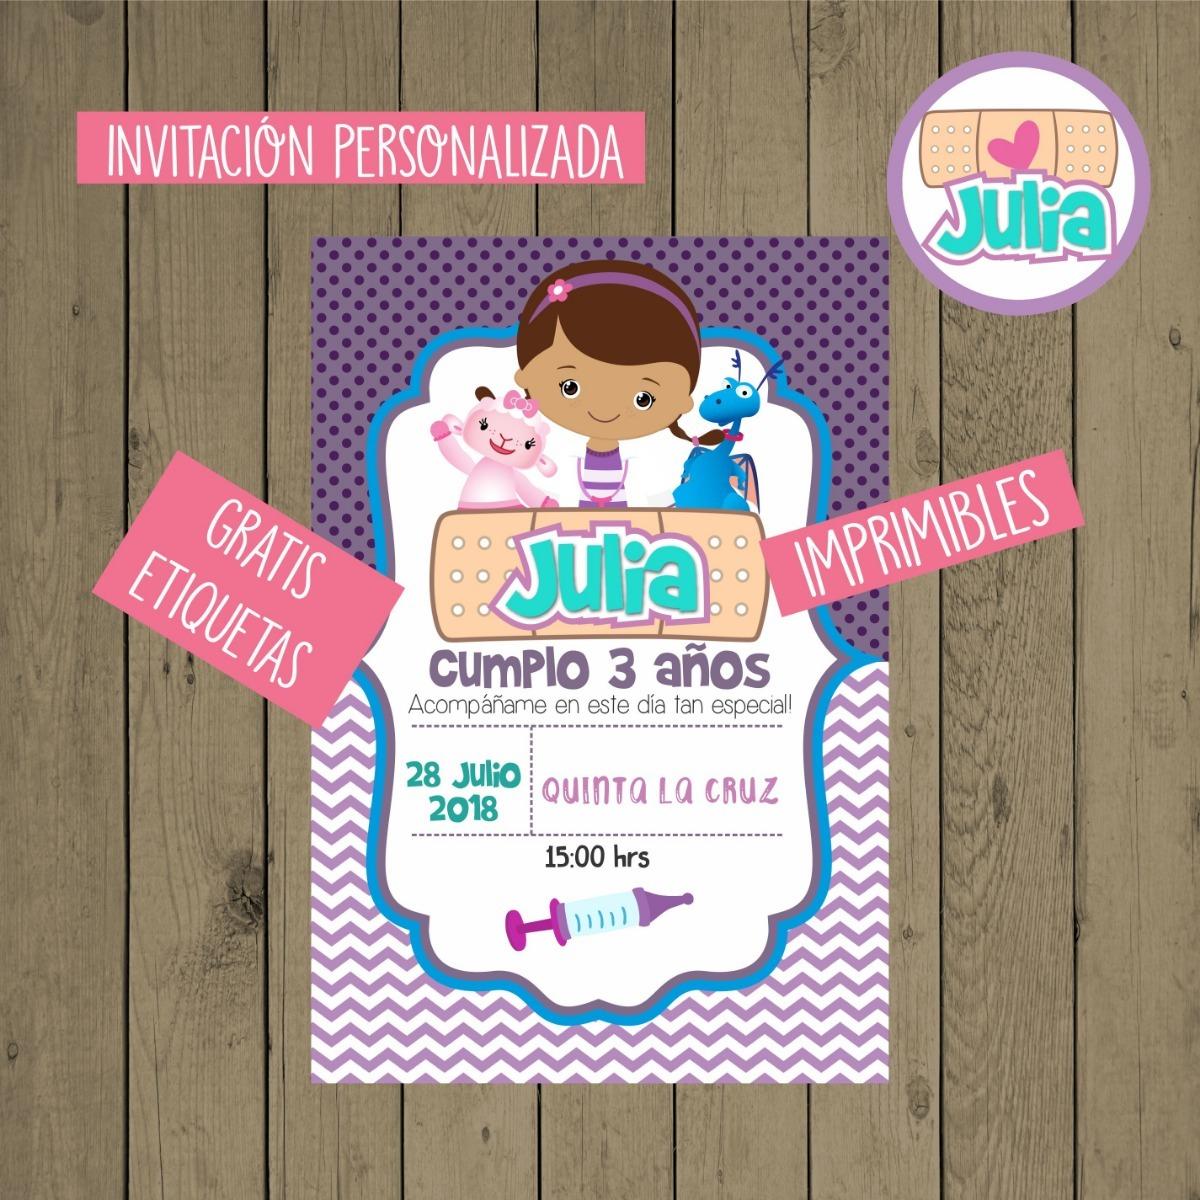 8ecfddb2bc5b5 Invitación Infantil Doctora Juguetes Presentación Niña -   80.00 en ...